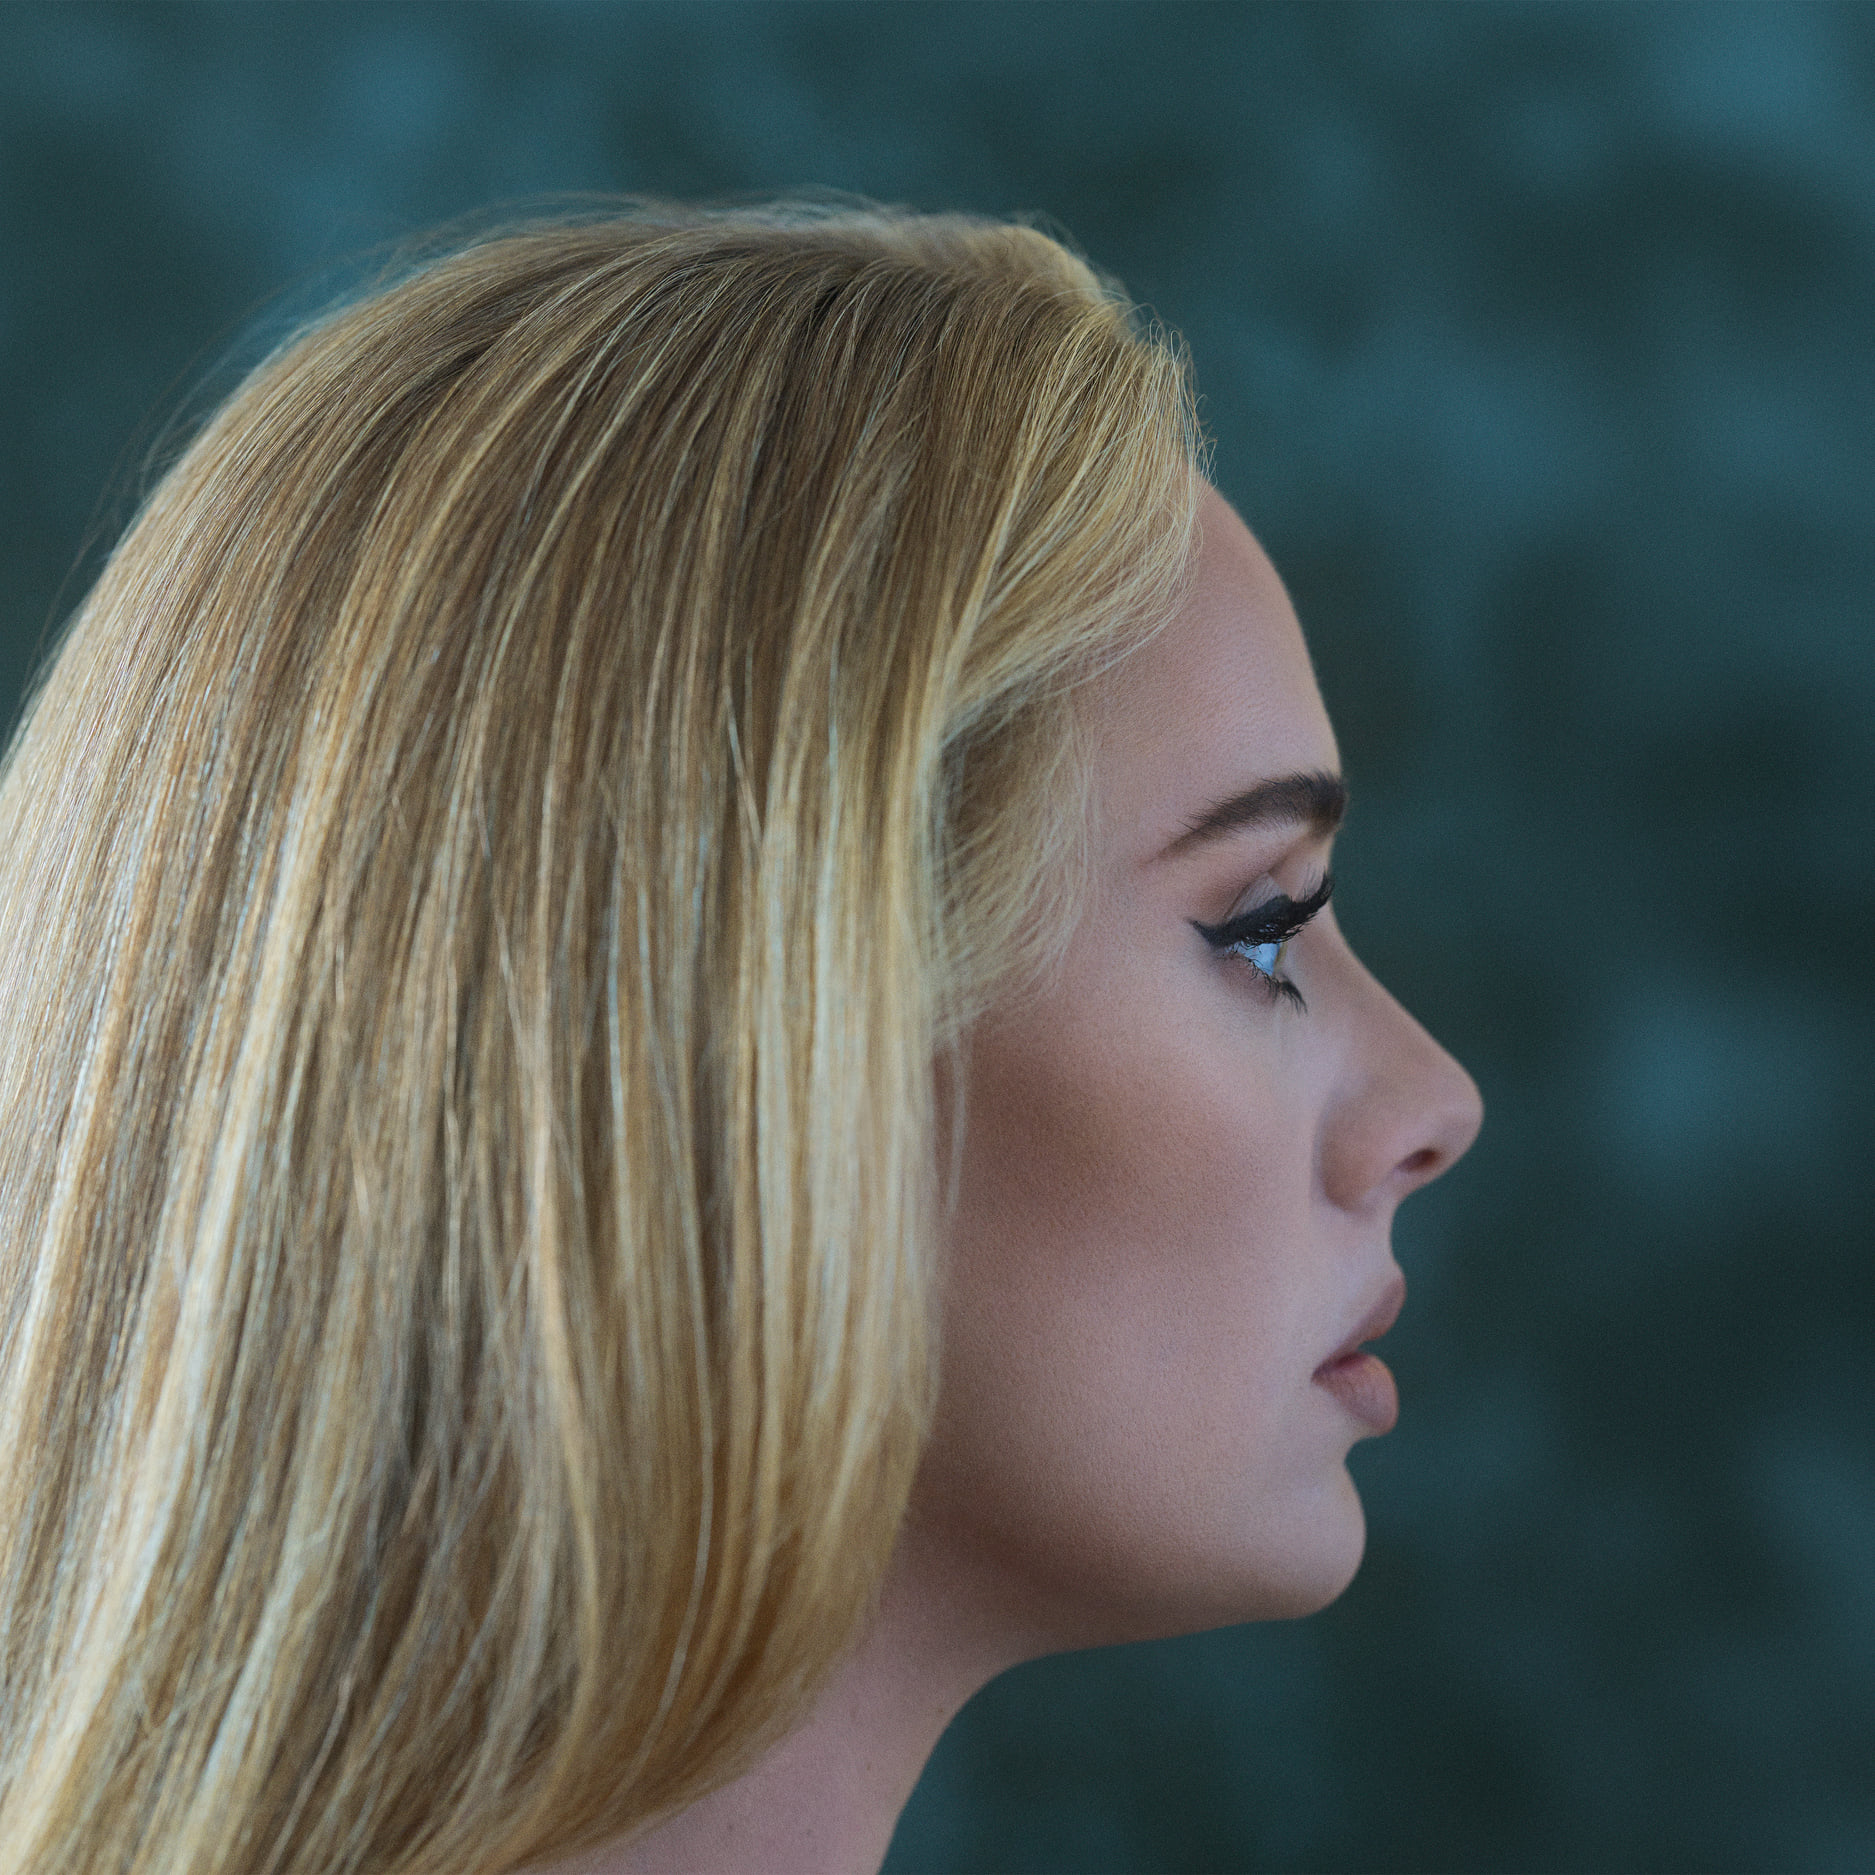 Adele 30